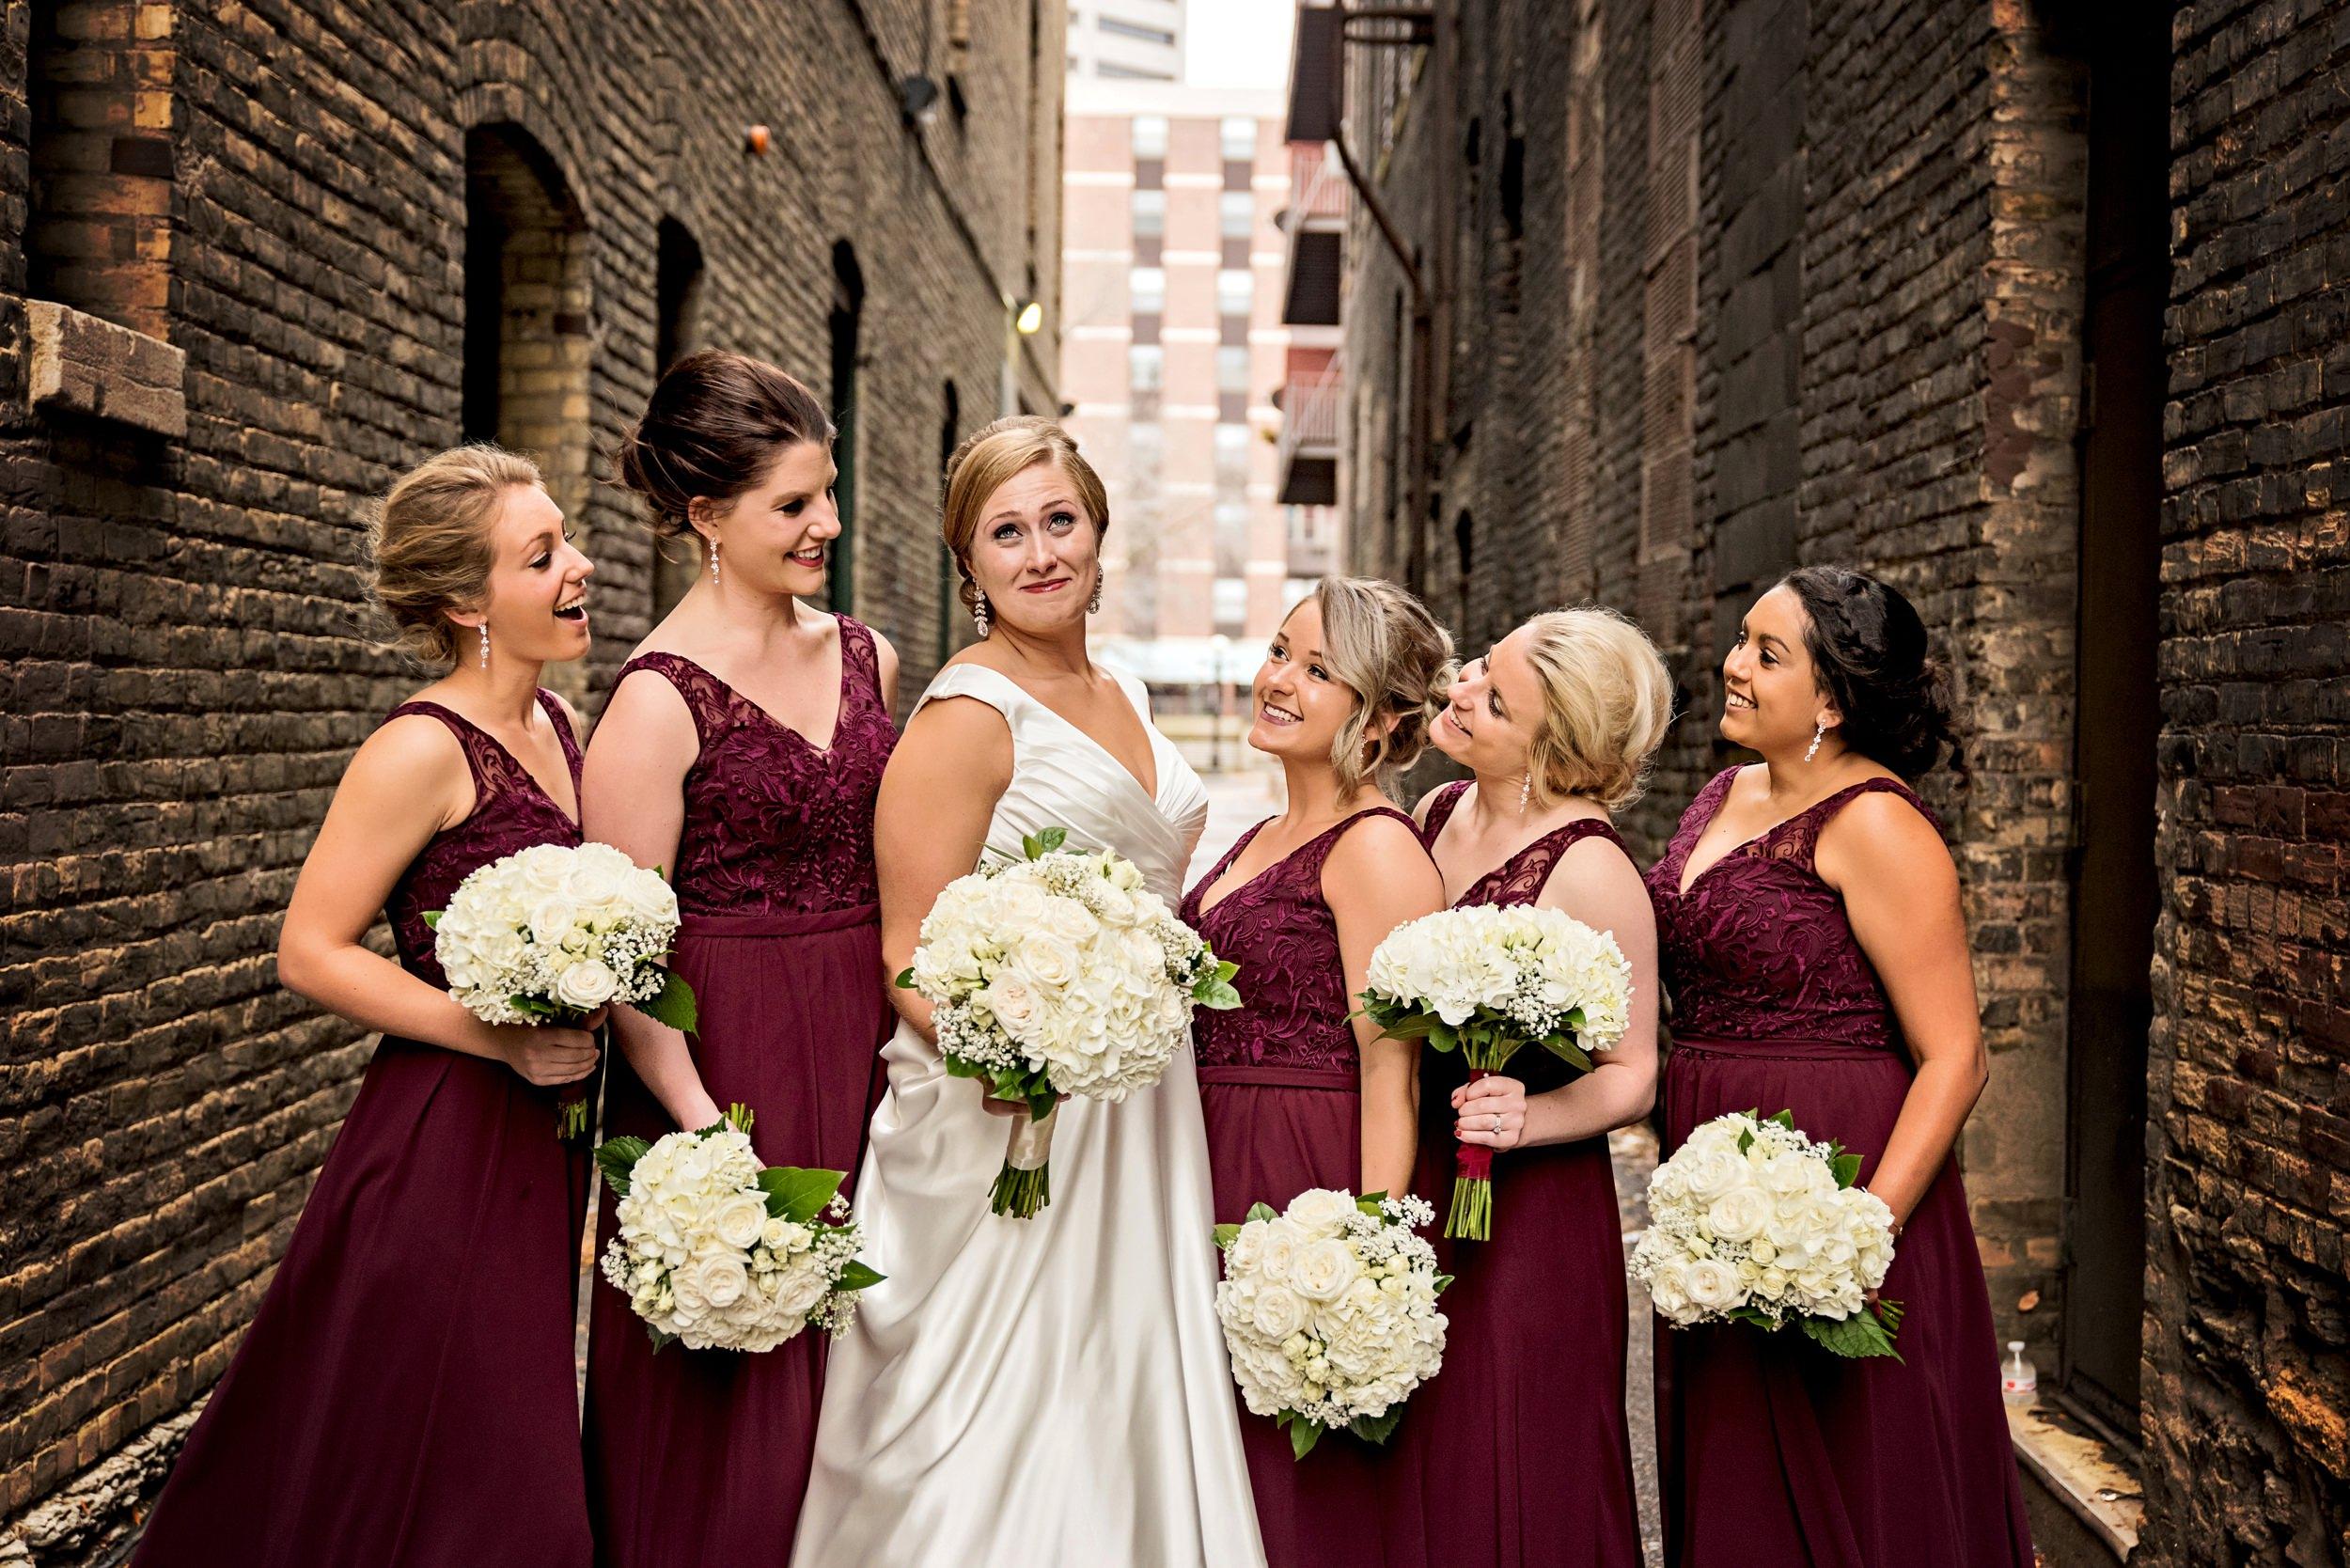 2018-Real-Wedding-Megan-Brenden-Rotella-Photography_0445.jpg